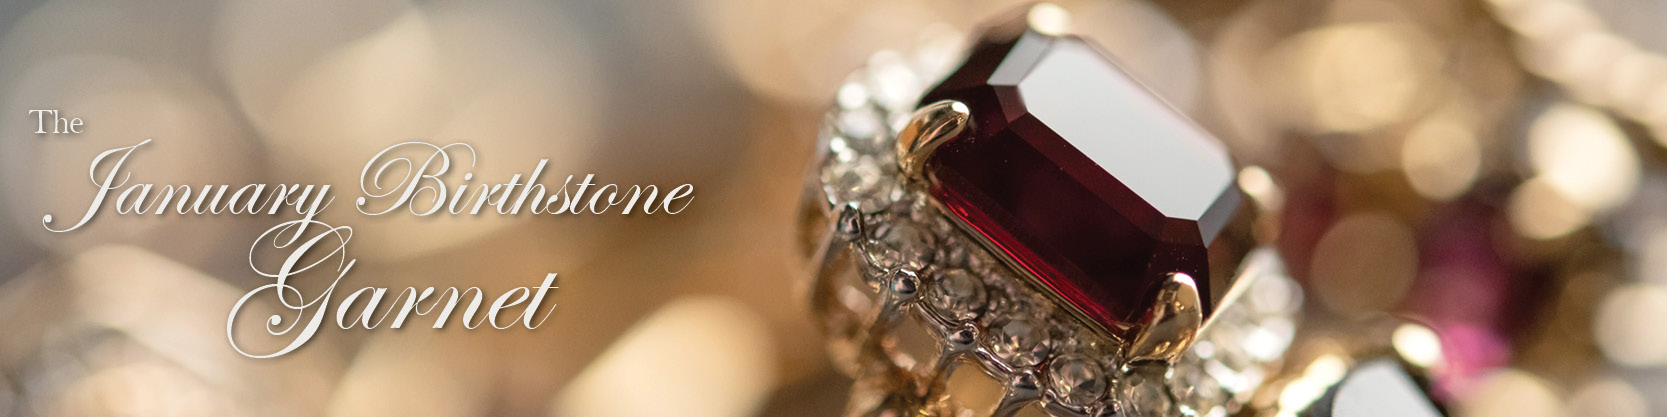 January birthstone vintage garnet rings - cubic zirconia - clear Swarovski crystals